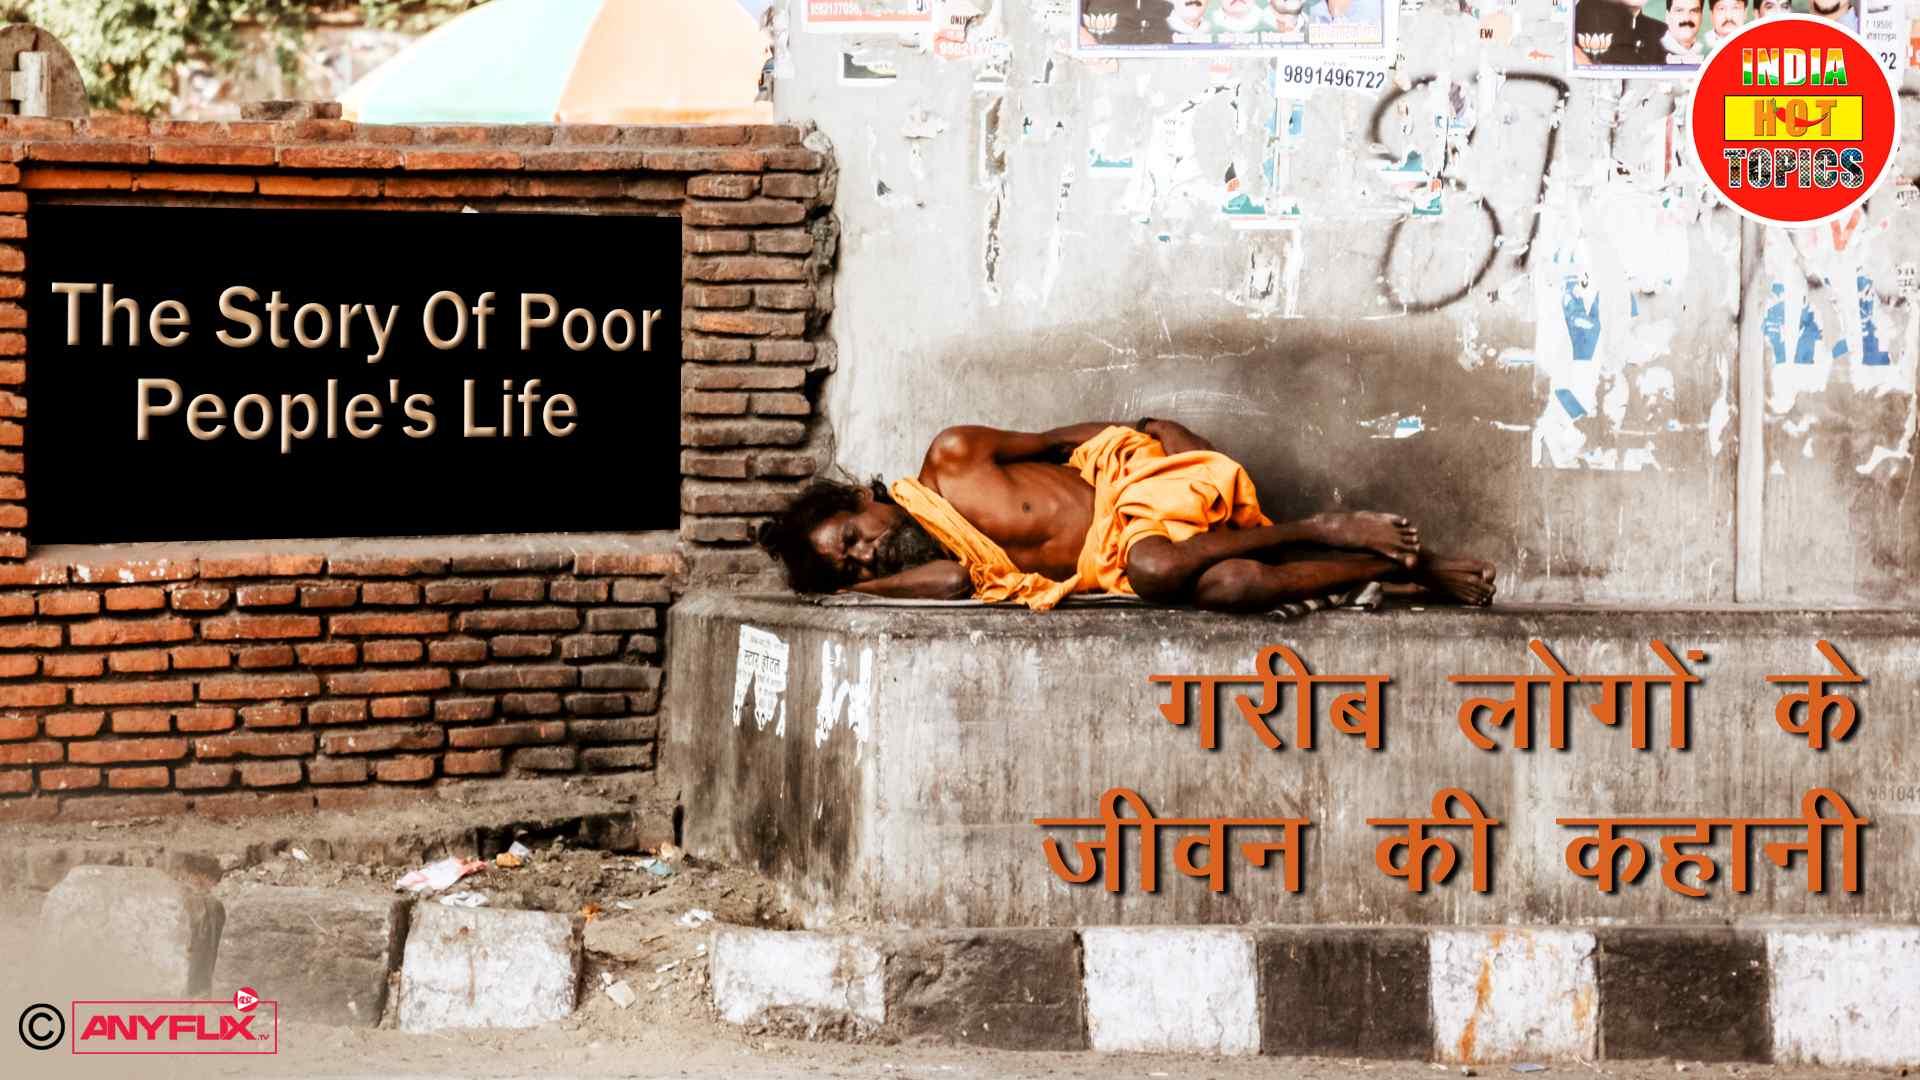 The Story Of Poor People's Life   Ye Zindagi Live   India Hot Topics